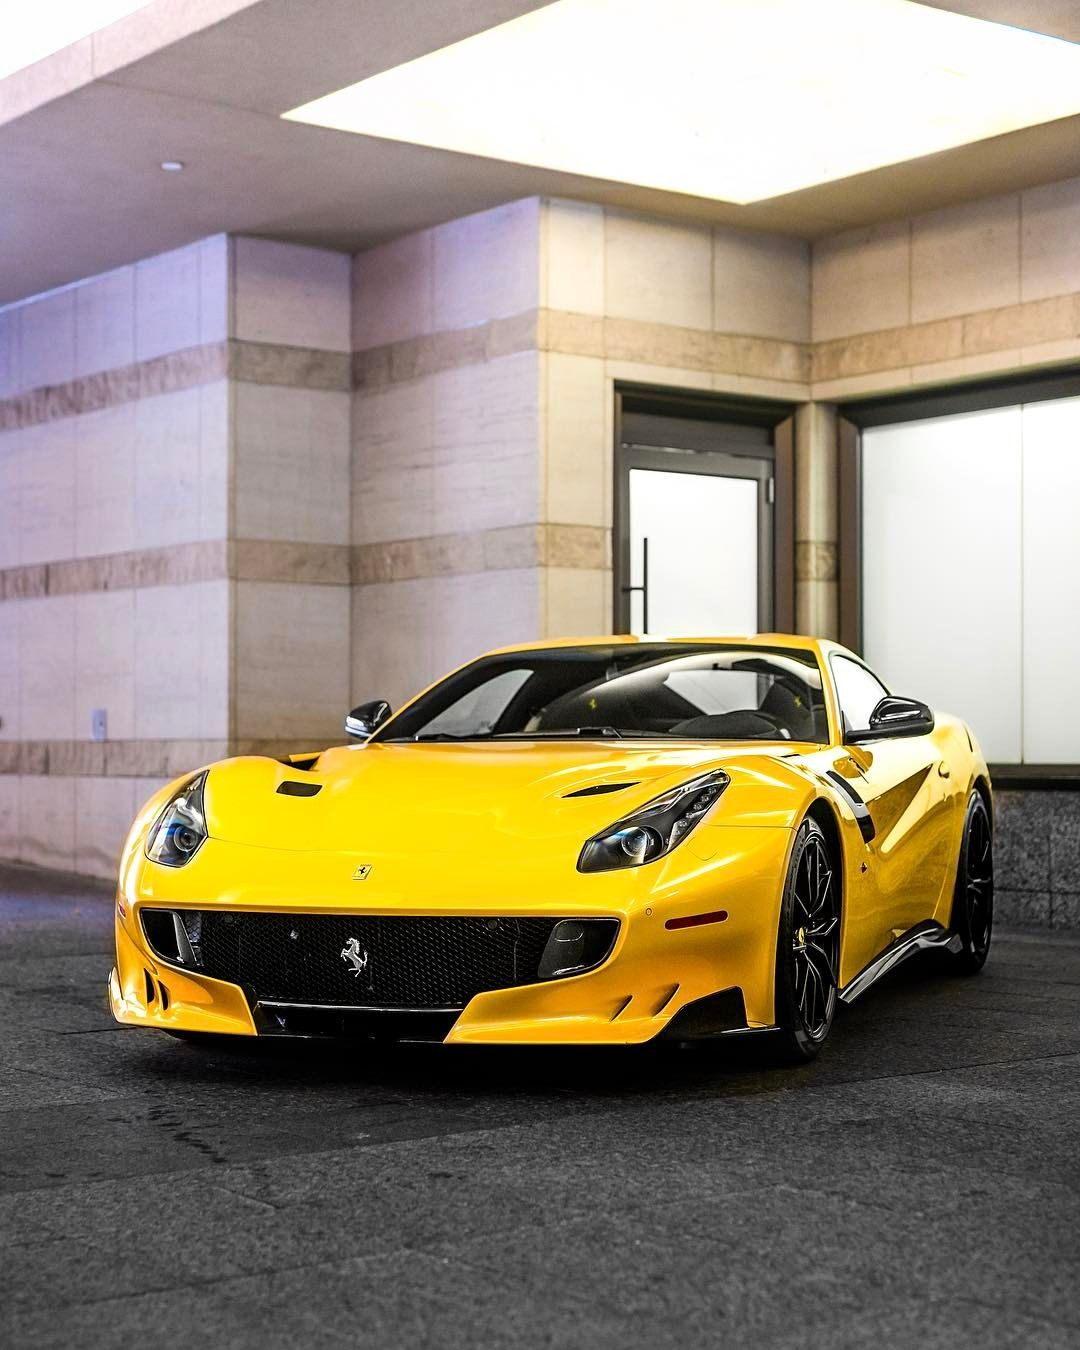 Ferrari F12 Tdf Sports Car Car Brands Ferrari F12 Tdf